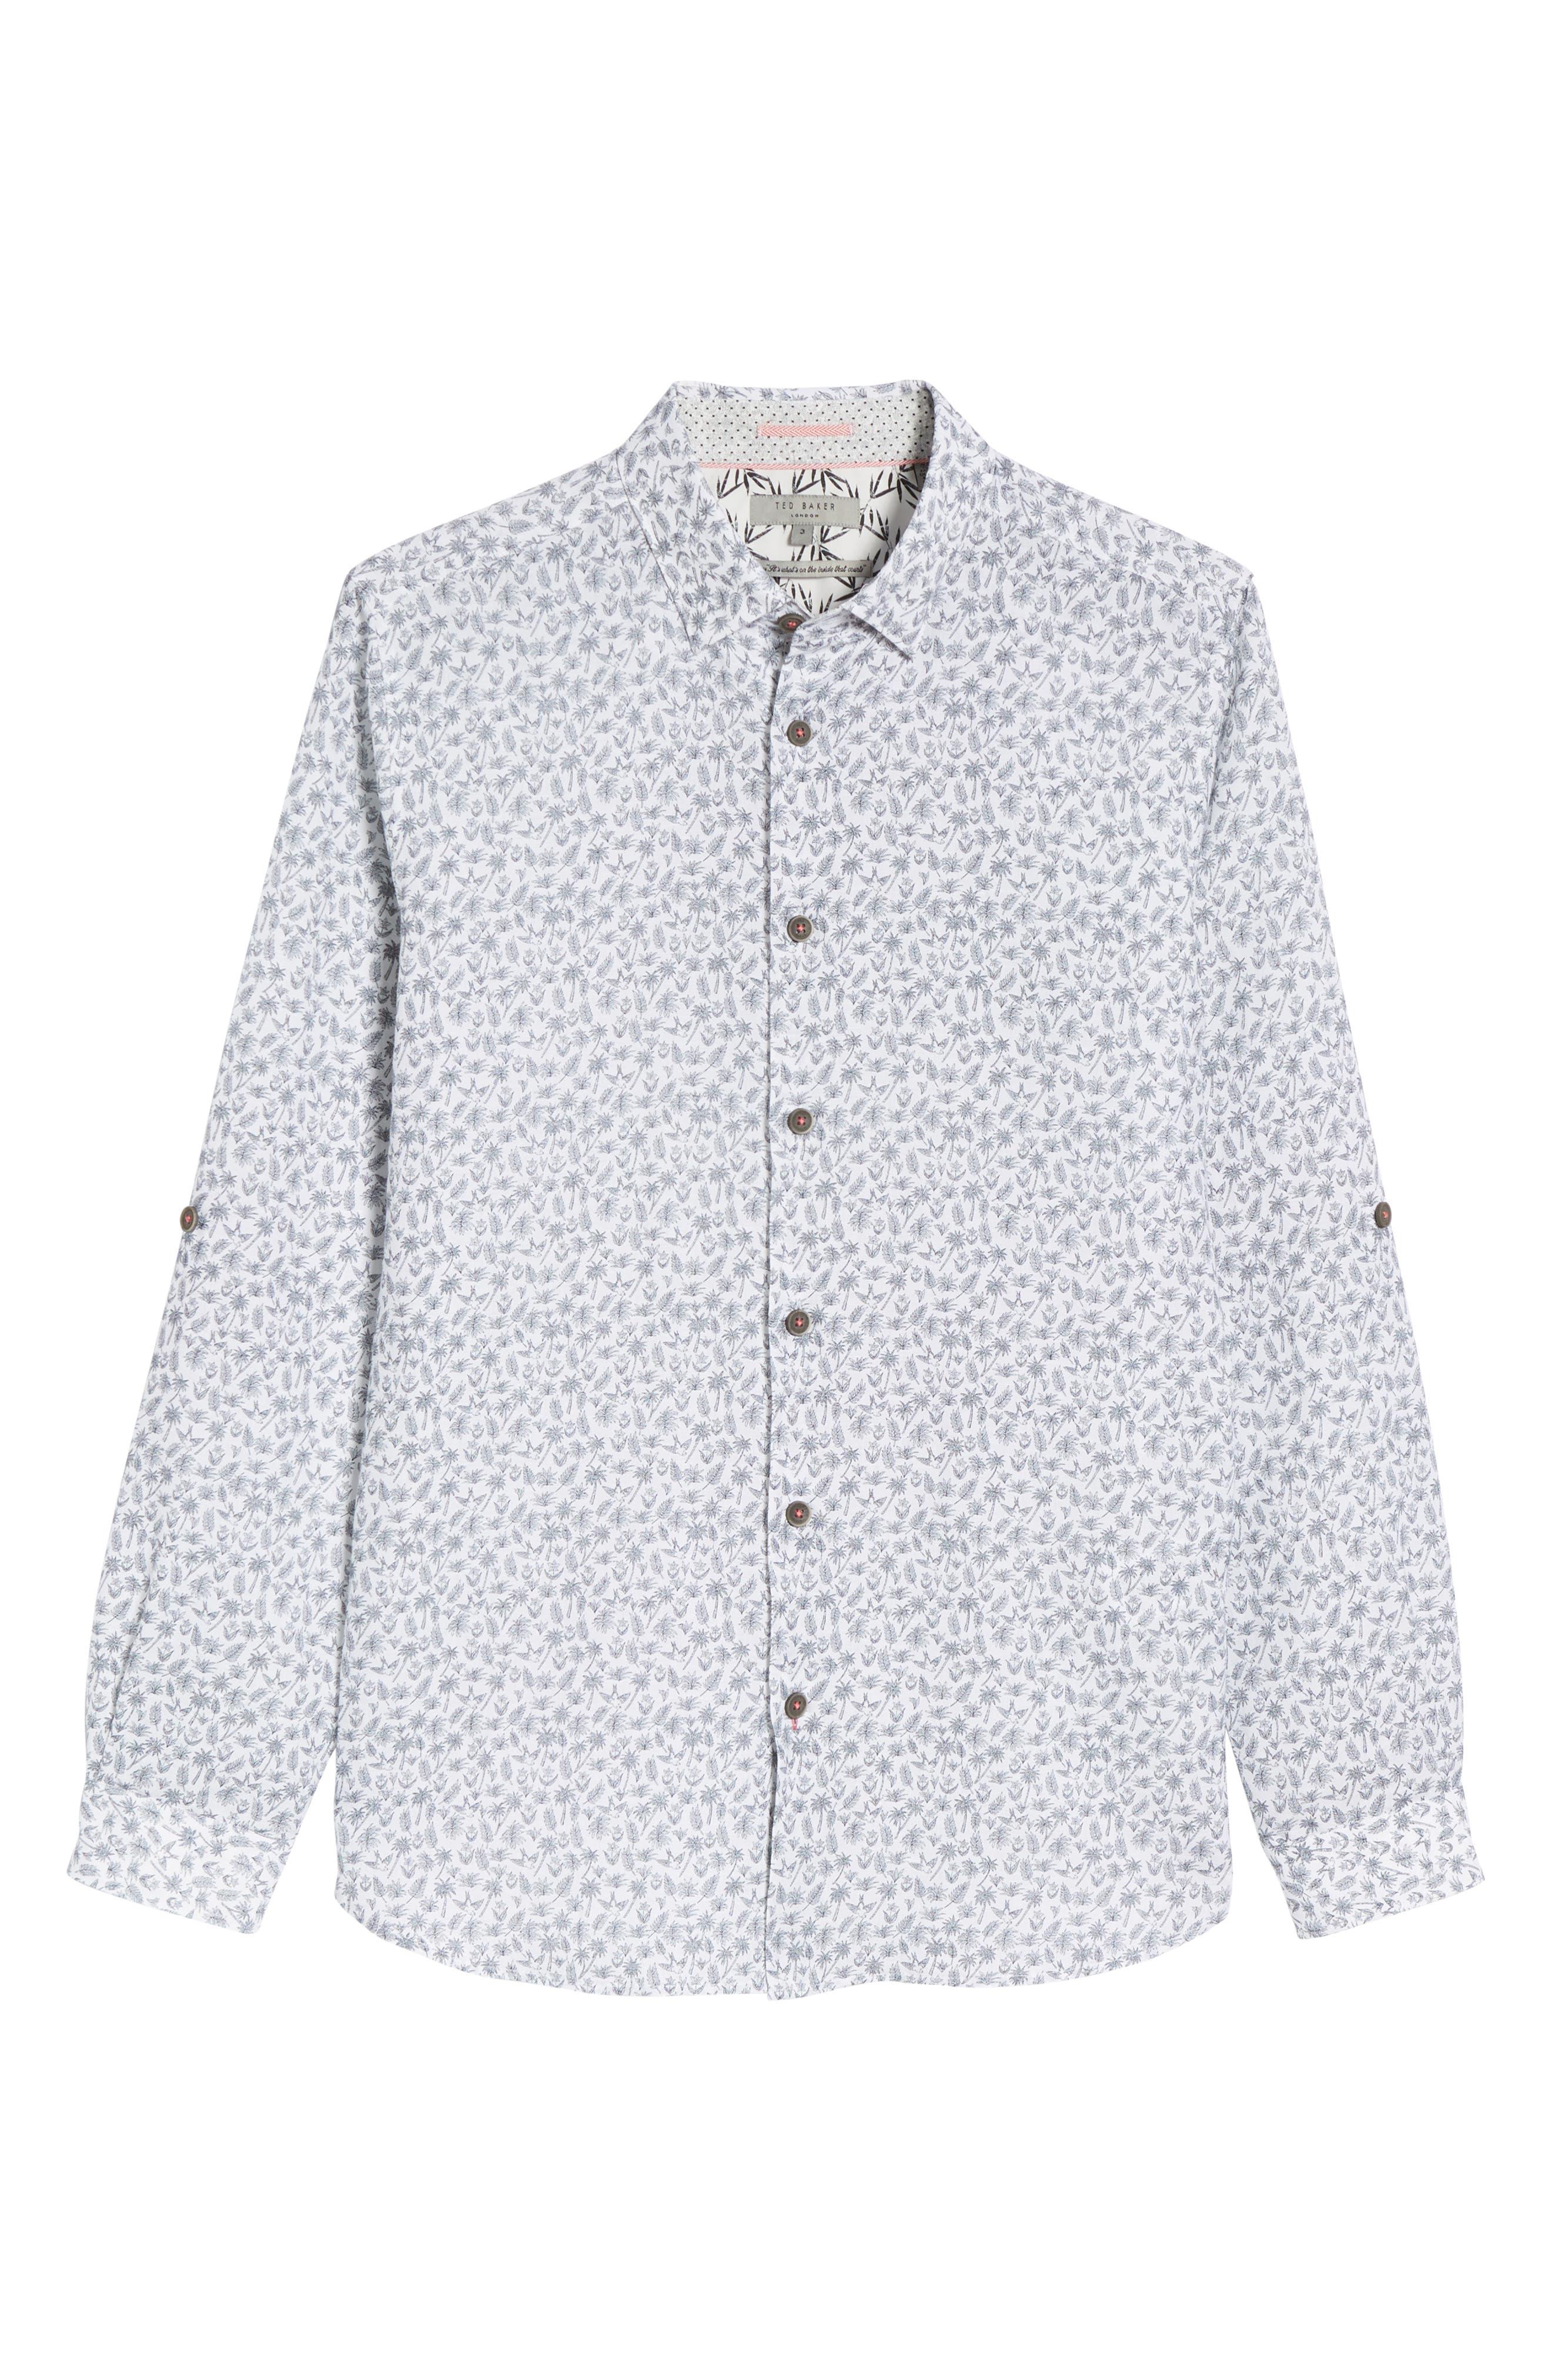 Nazta Trim Fit Tropical Print Sport Shirt,                             Alternate thumbnail 6, color,                             WHITE